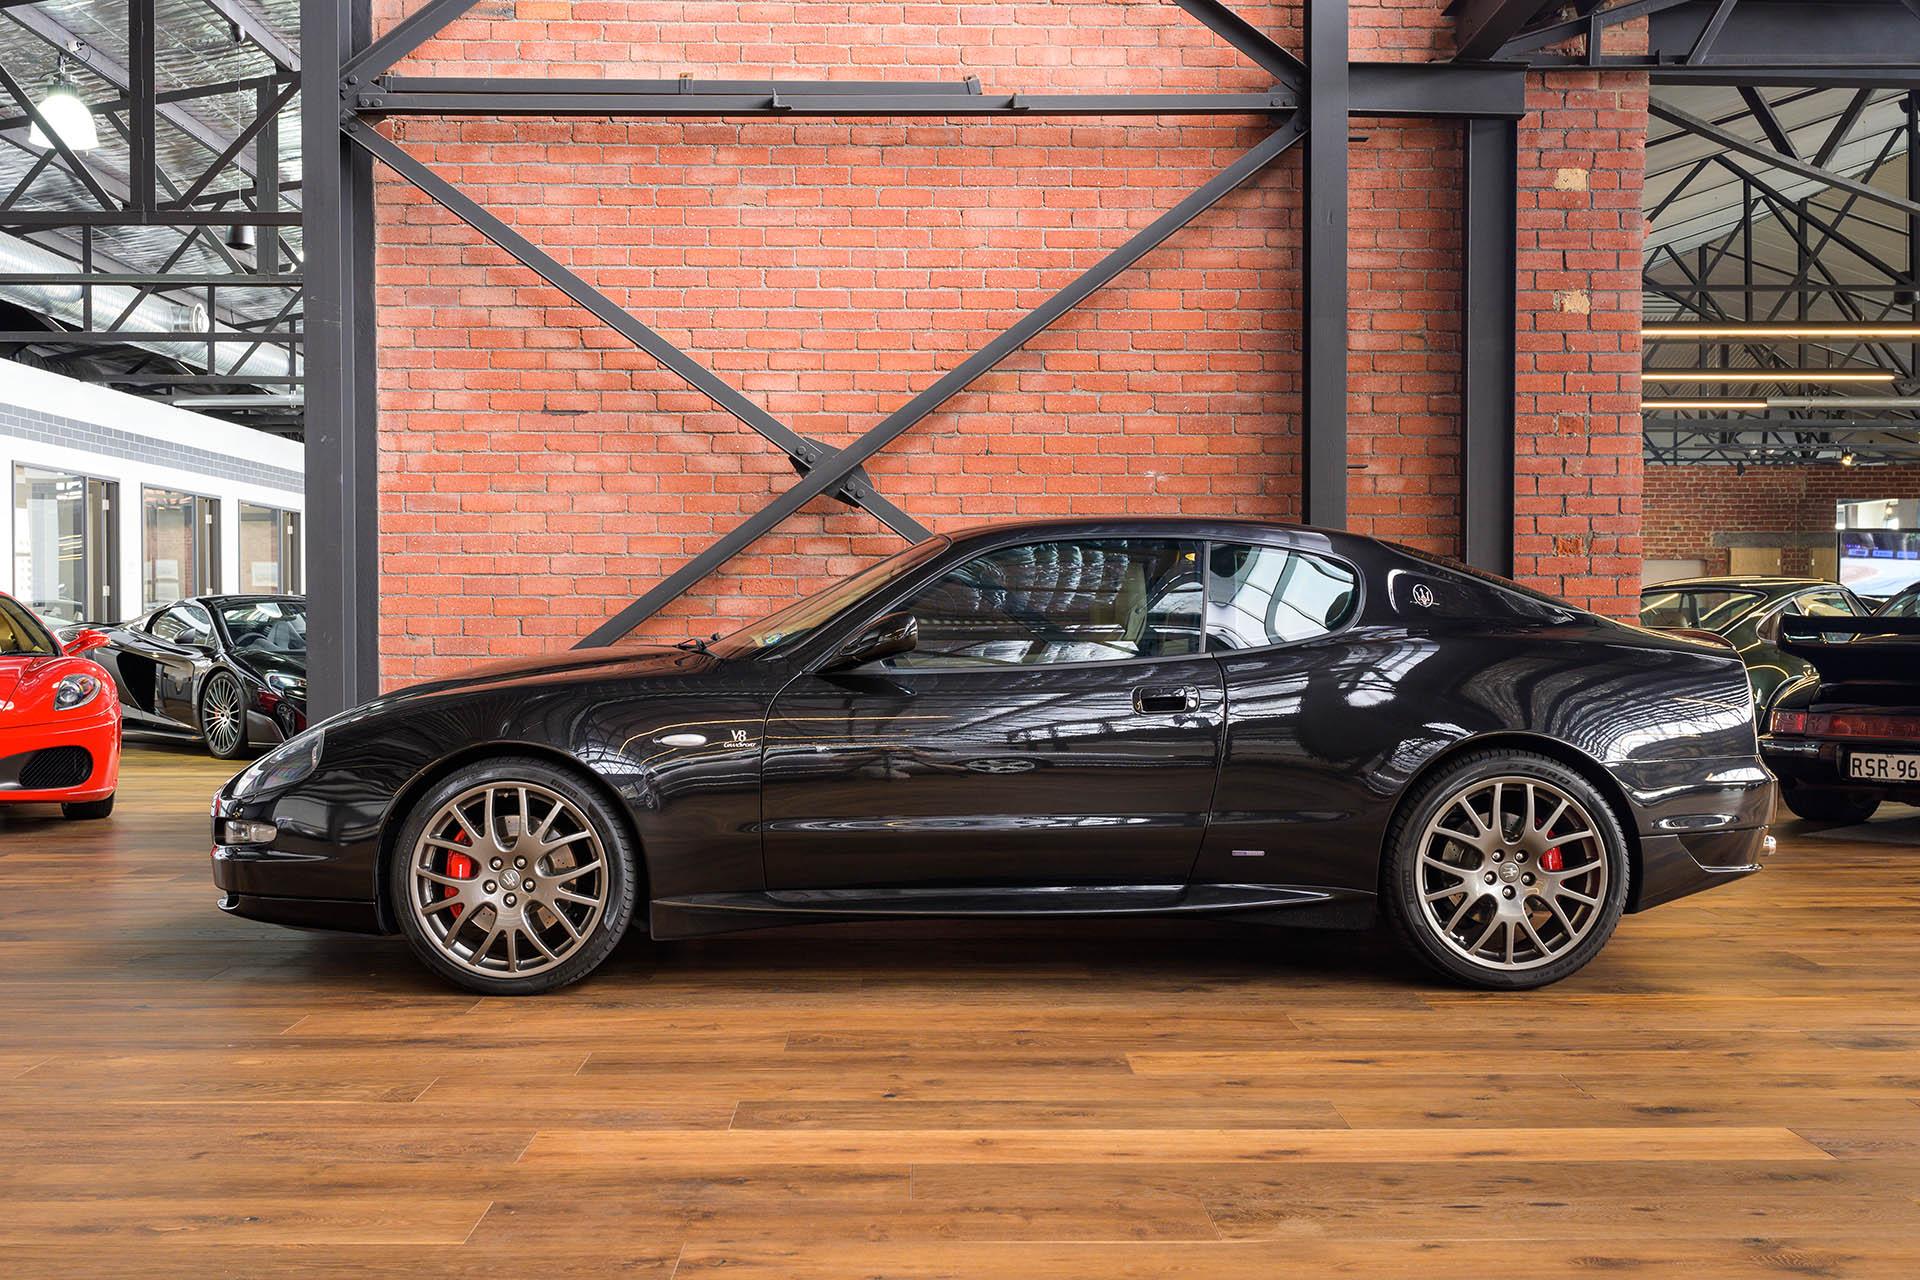 2007 Maserati Gransport M138 Coupe - Richmonds - Classic and Prestige Cars - Storage and Sales ...